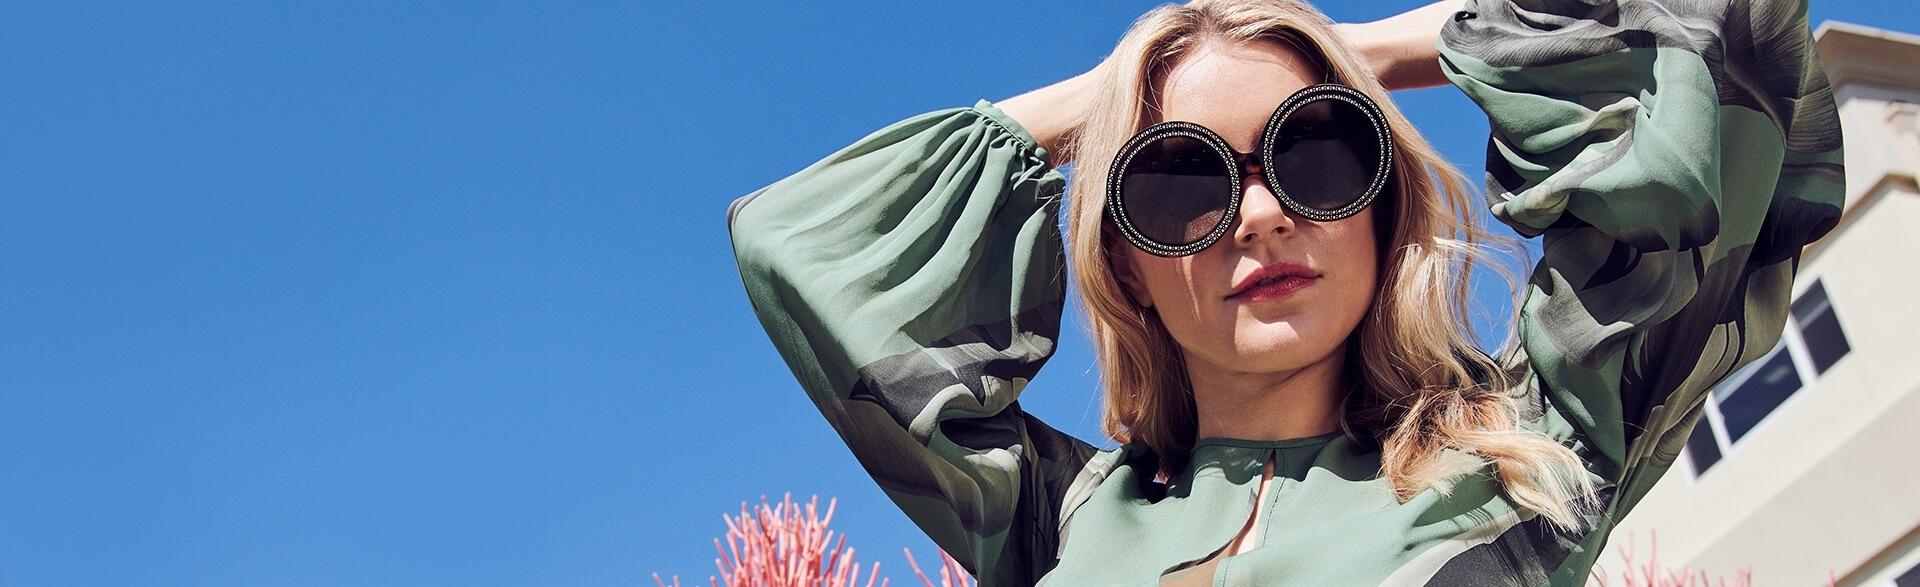 5d025f0ec3d0 Sunny Frames of Mind Spring 2019 Sunglasses Editorial | Saks.com